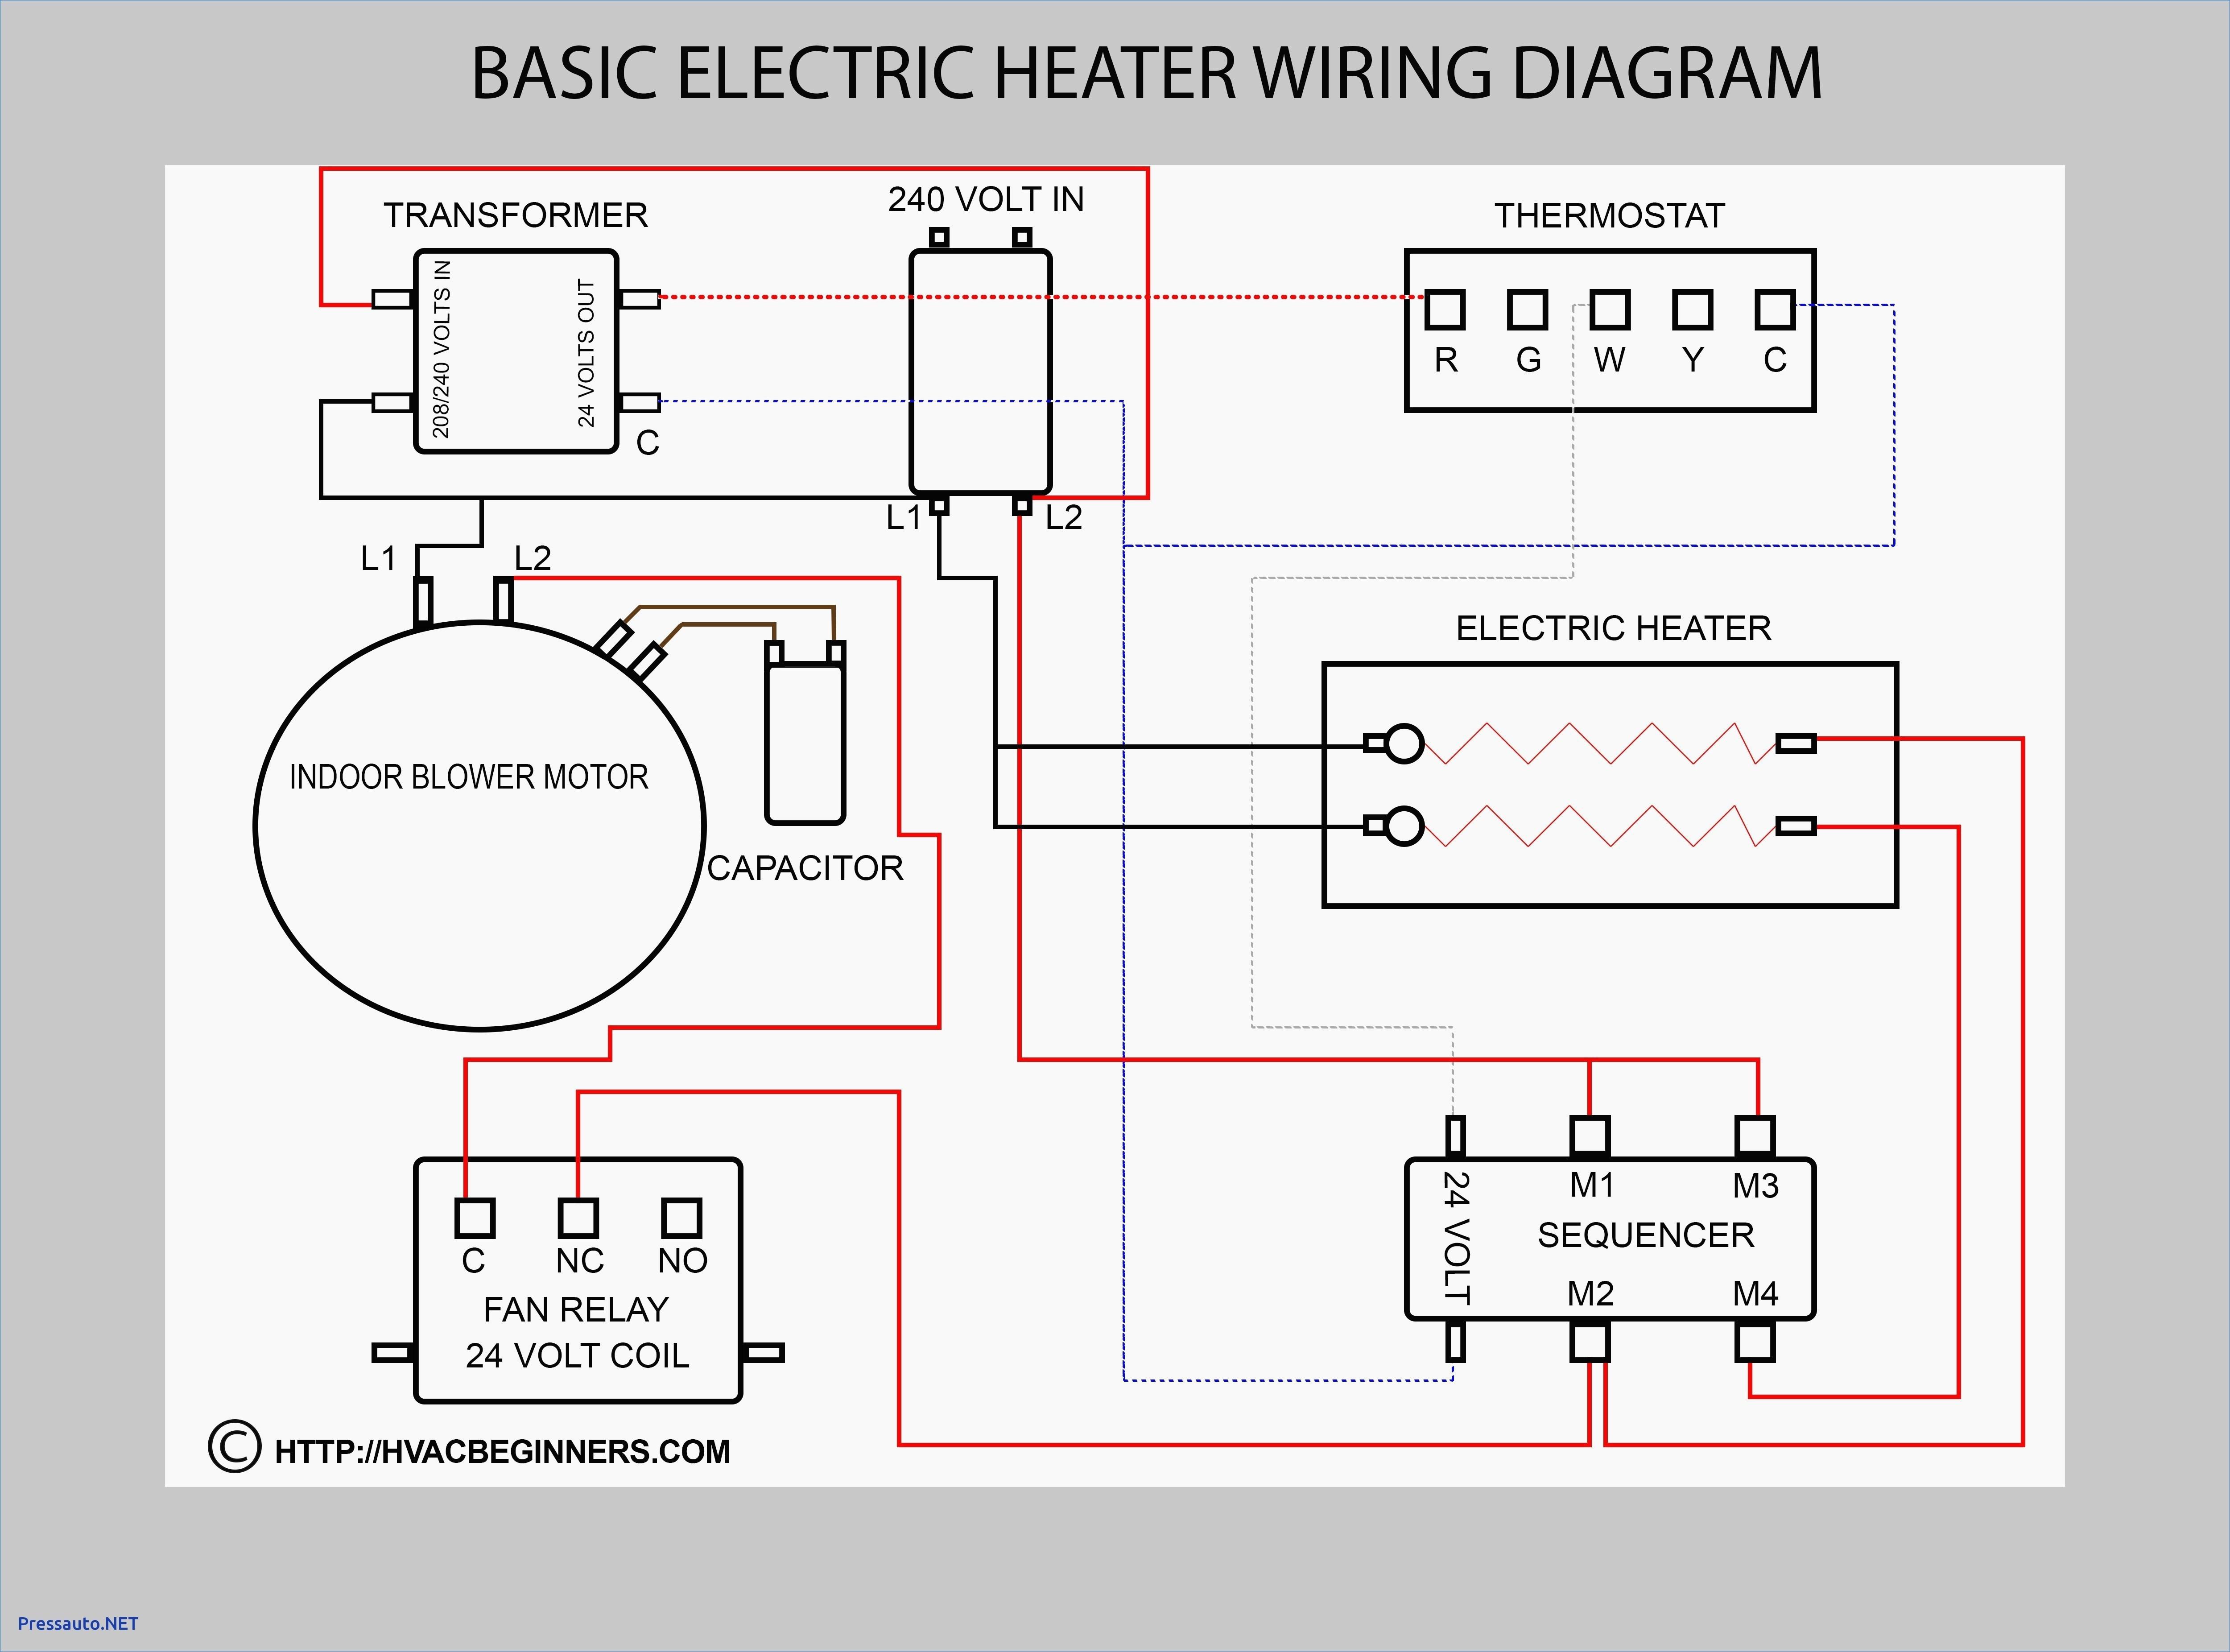 Edwards Transformer 599 Wiring Diagram